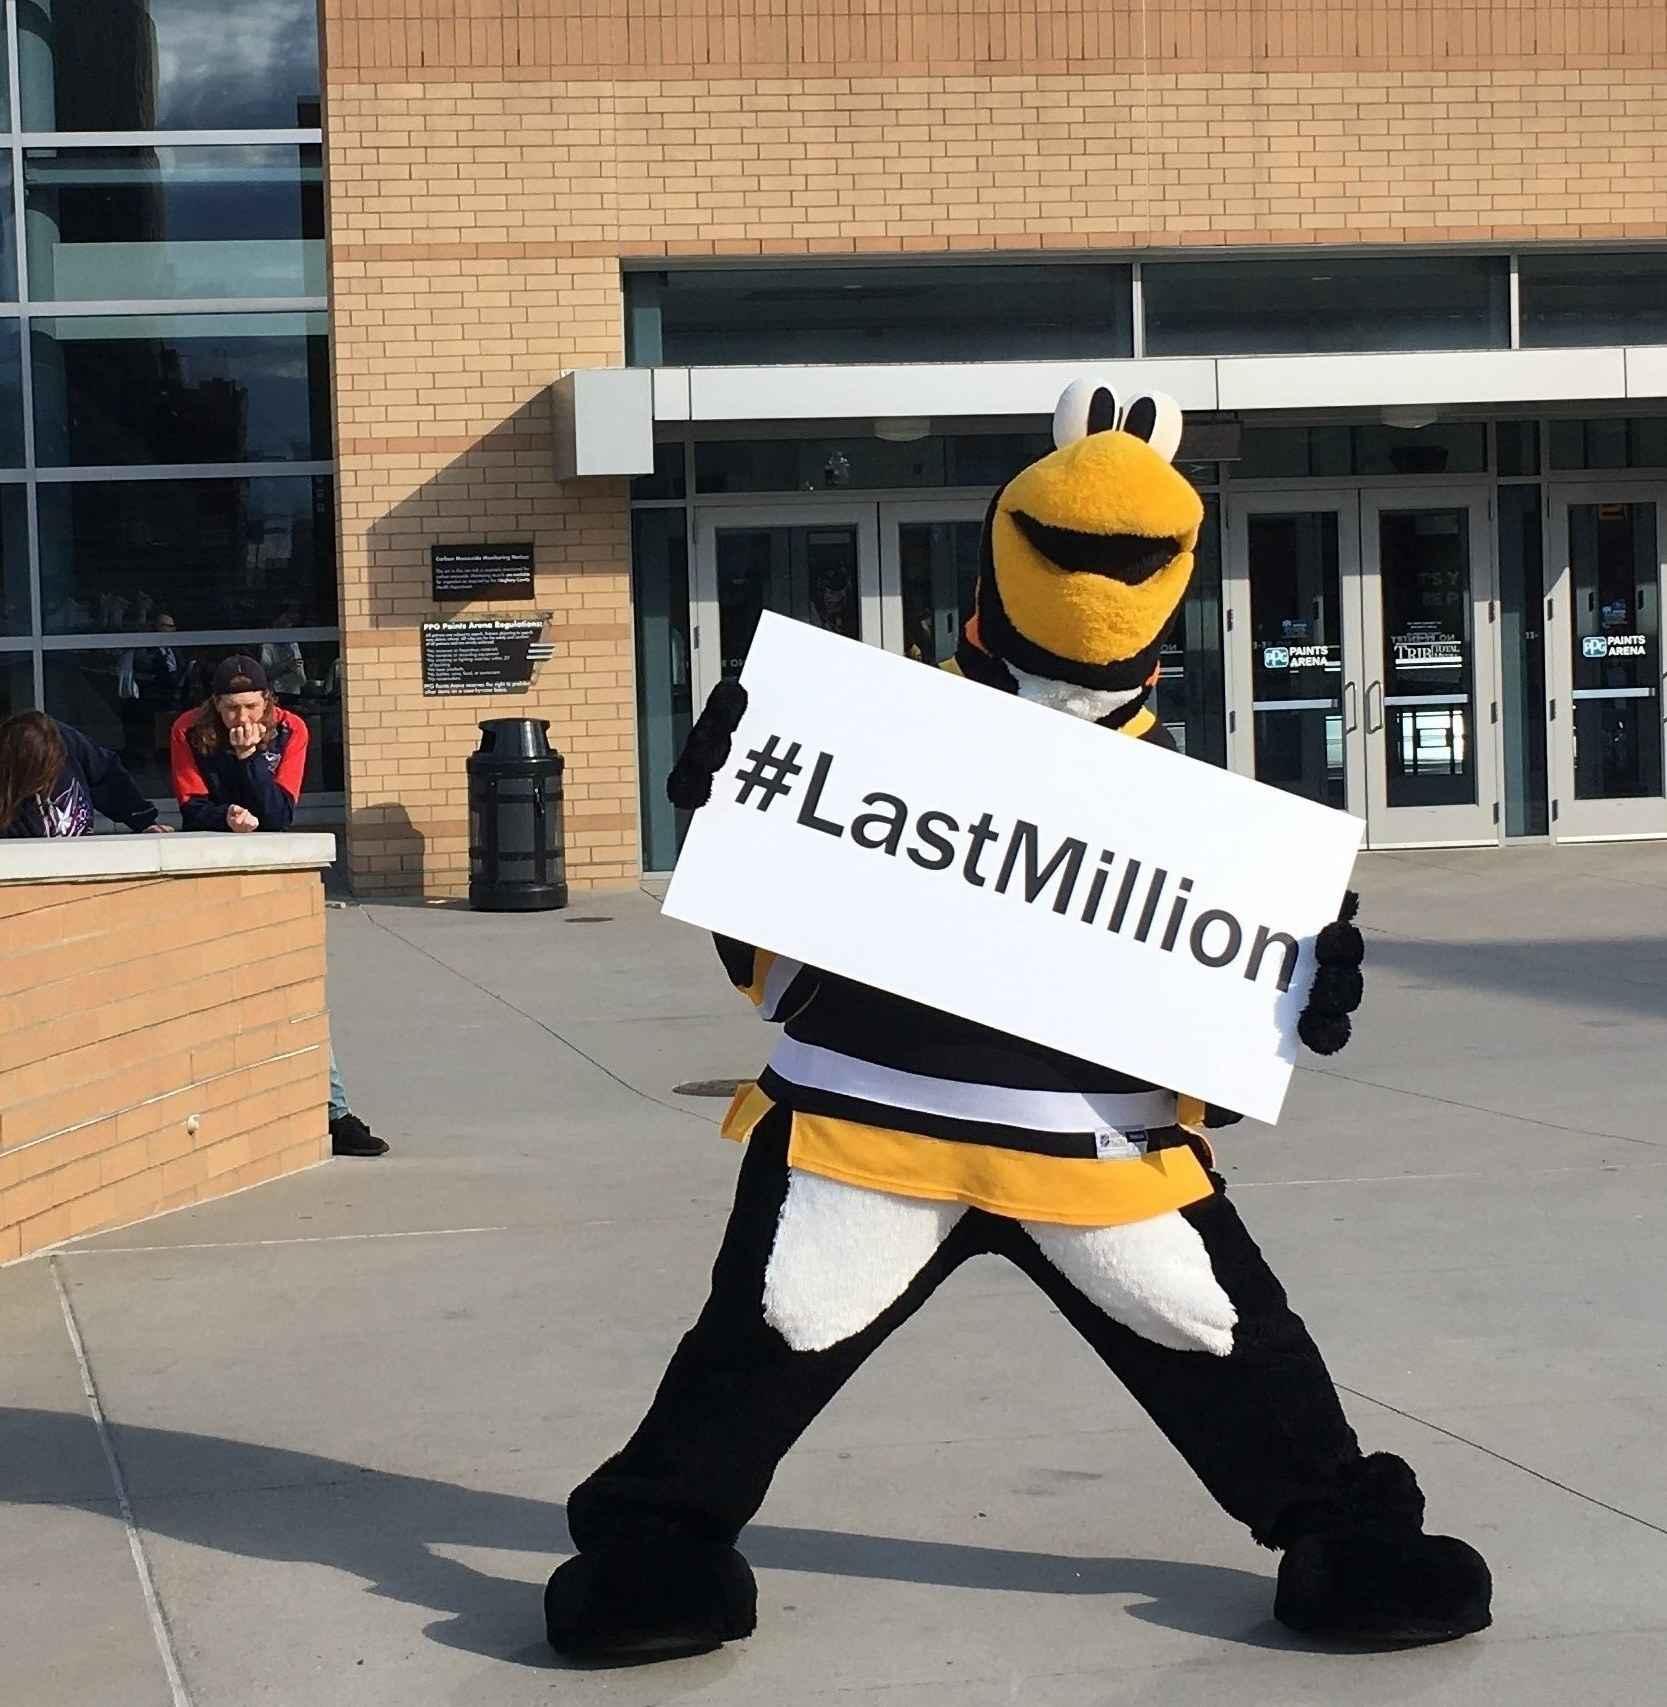 It's our #LastMillion image